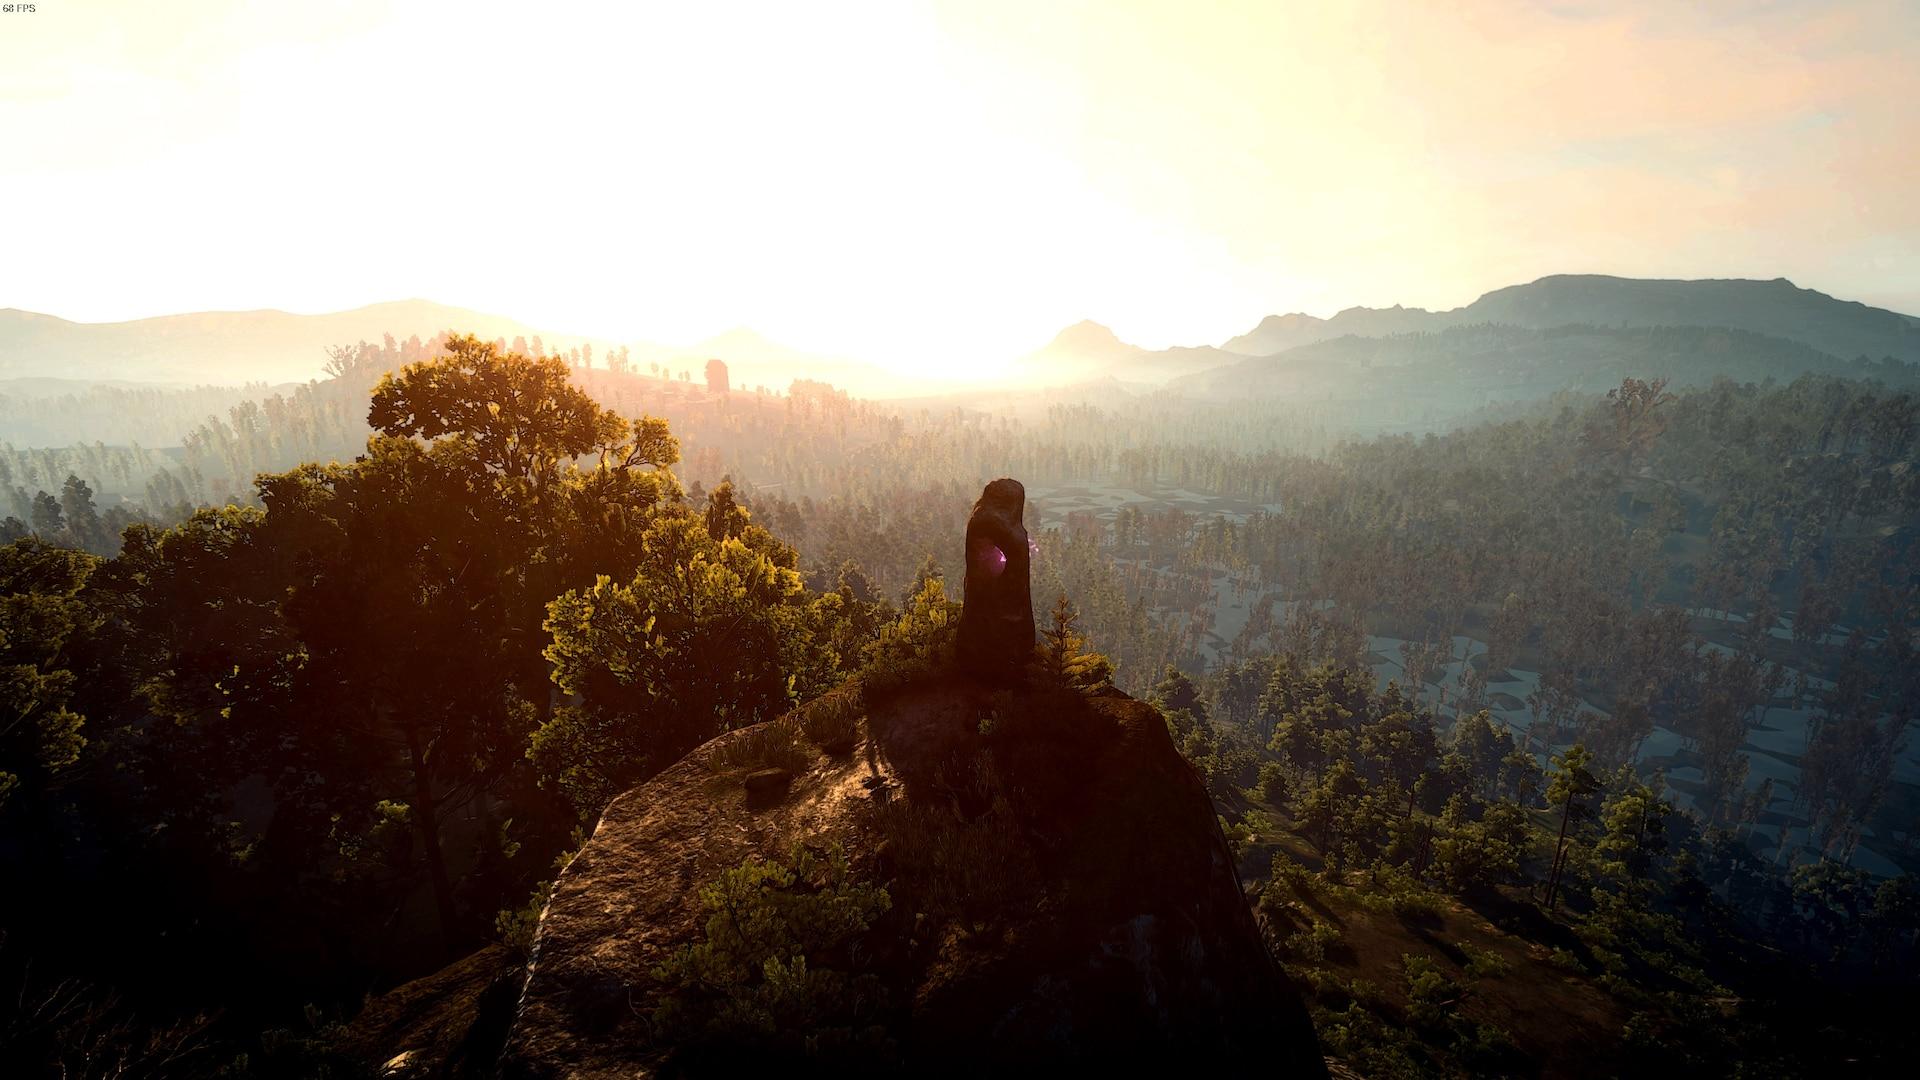 rtfuhgfh.jpg - Witcher 3: Wild Hunt, the